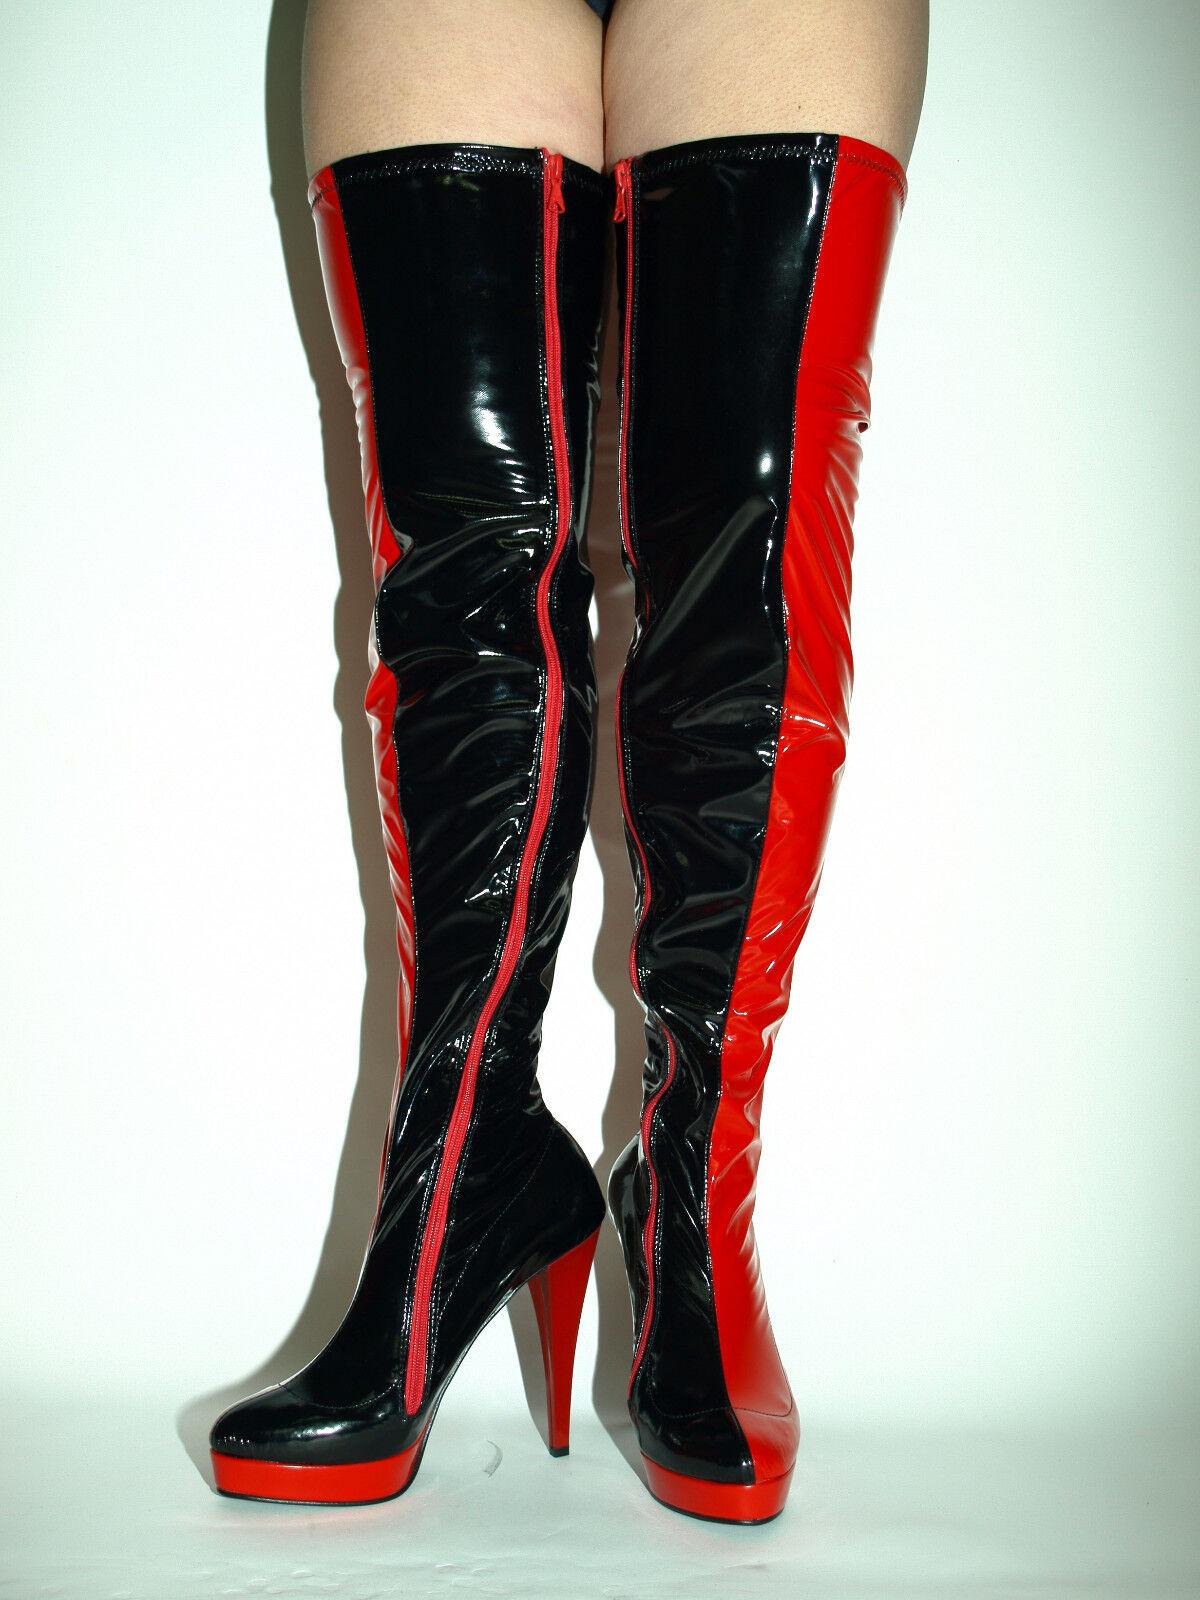 schwarz-rot patent elastick leather leather leather Stiefel Größe 5-16 HEELS-5,5 - PRODUCER POLAND a1fcb1